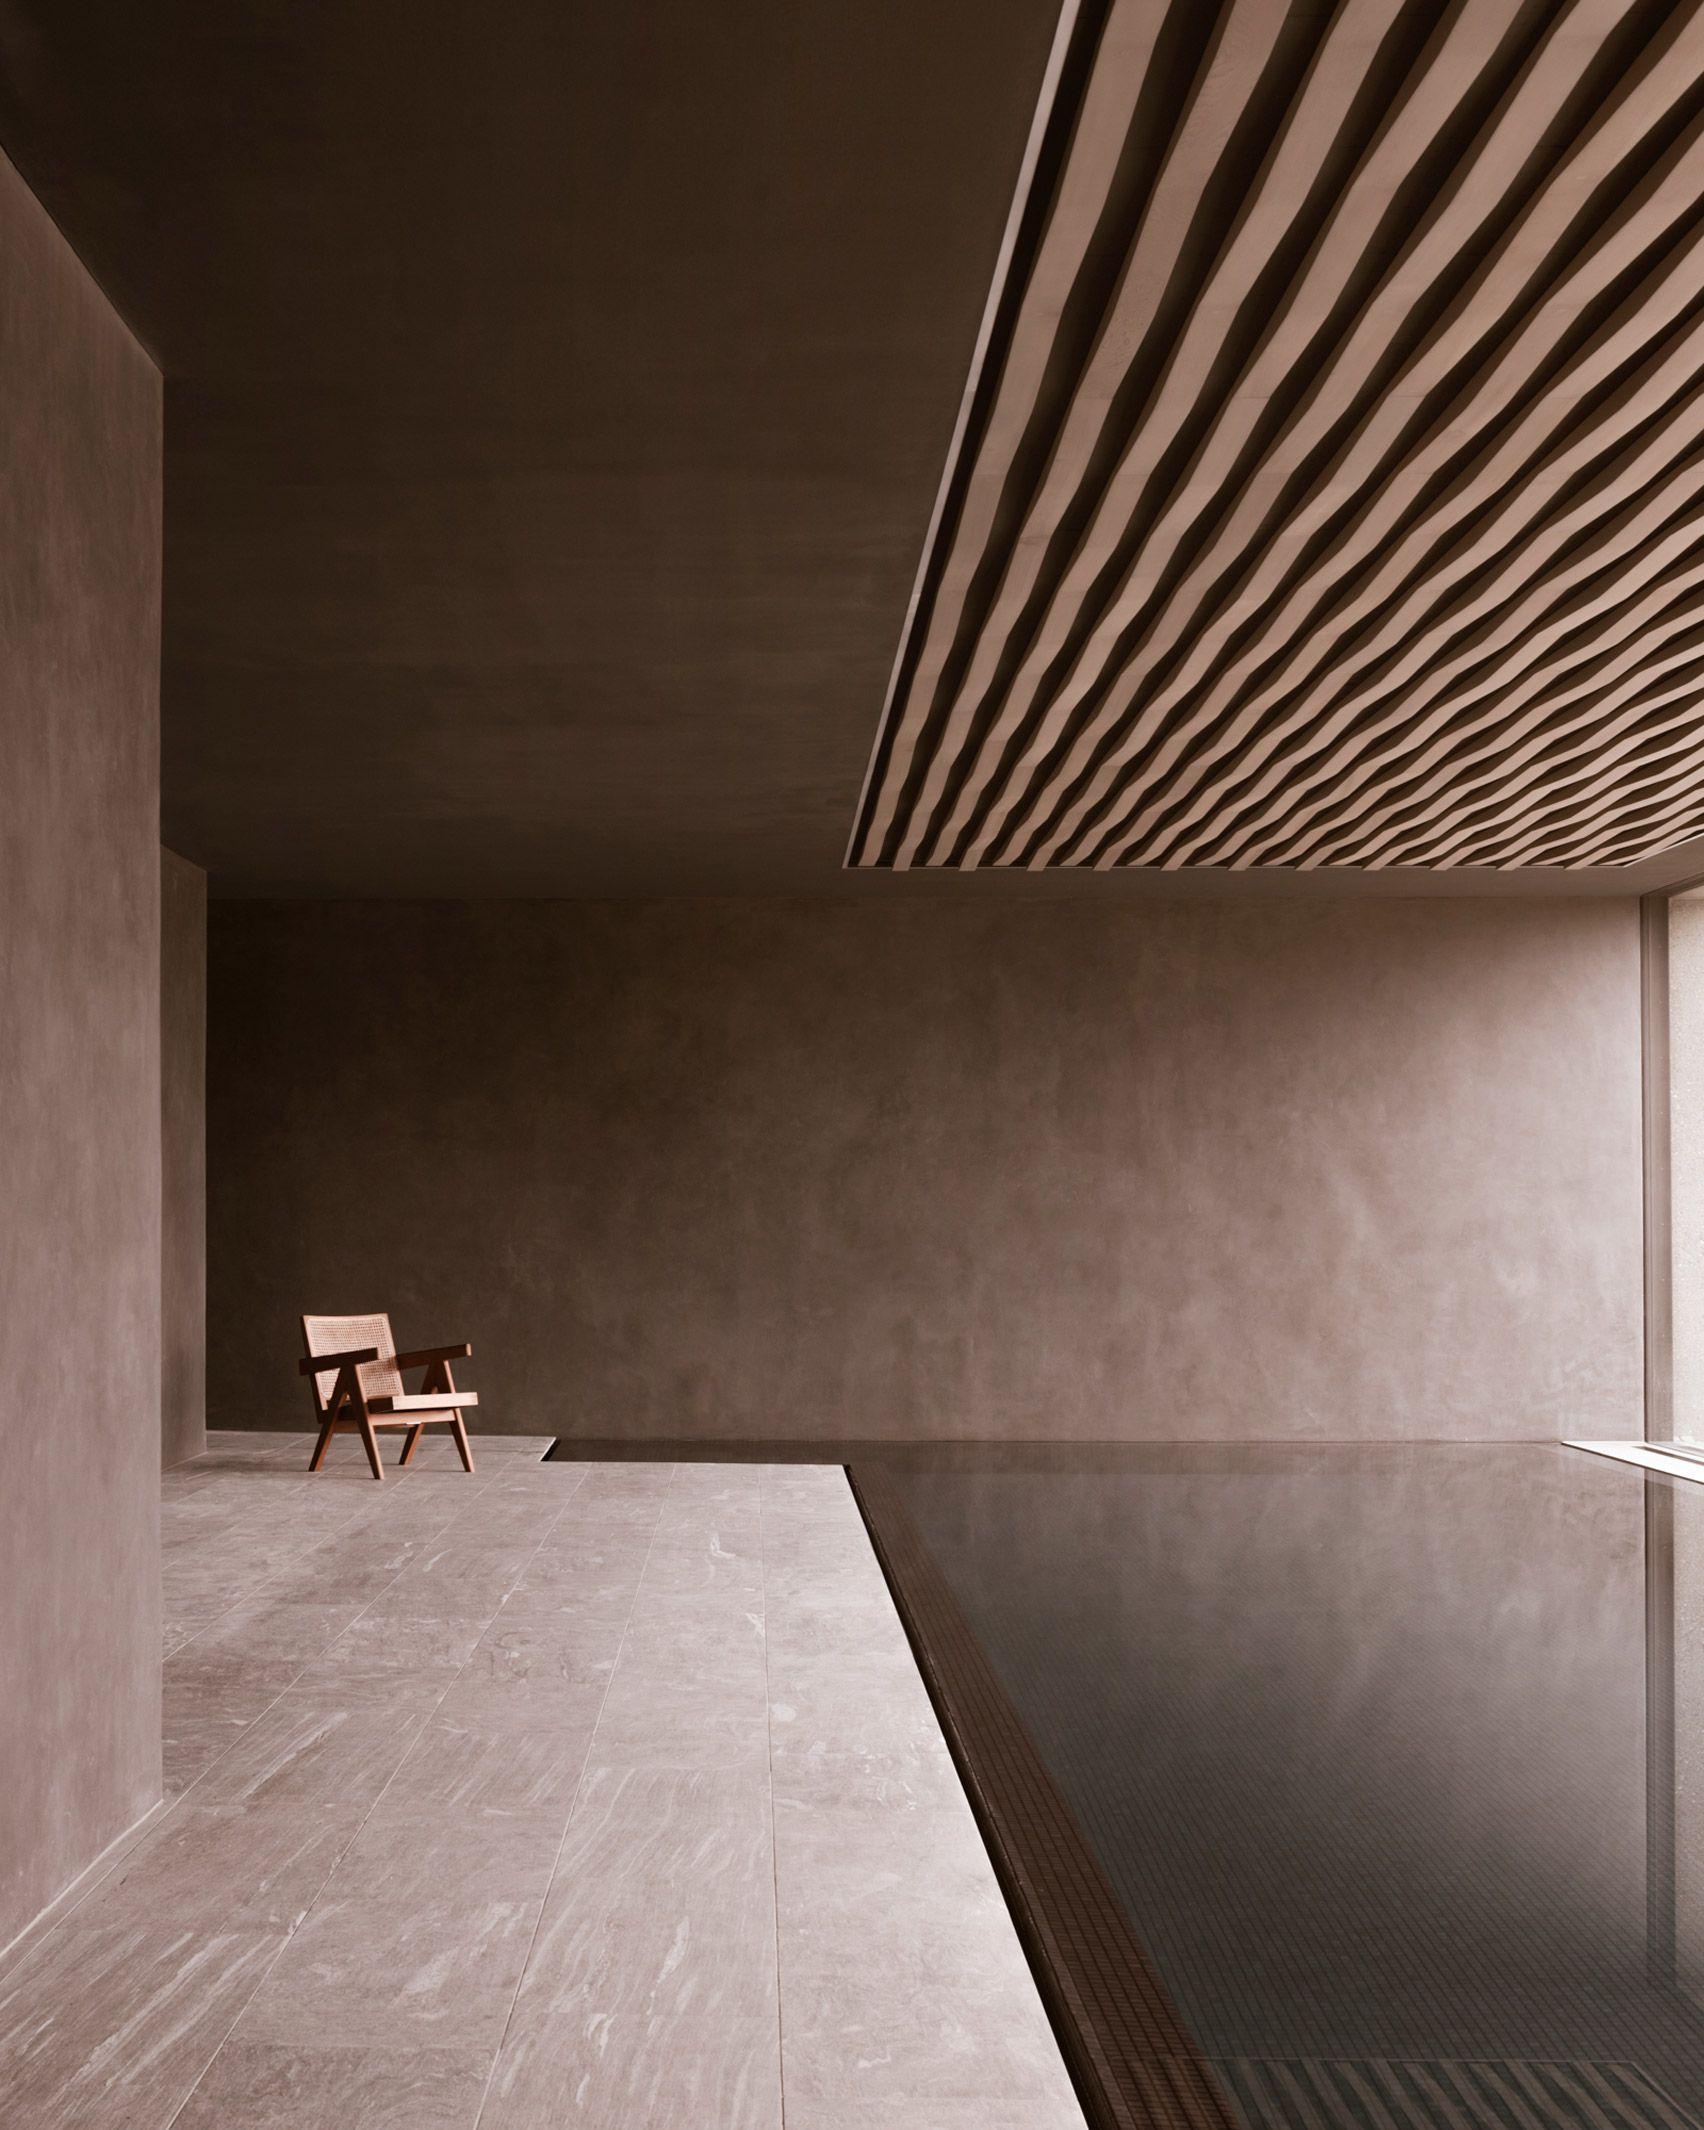 Think Architecture creates minimal hilltop house in Switzerland